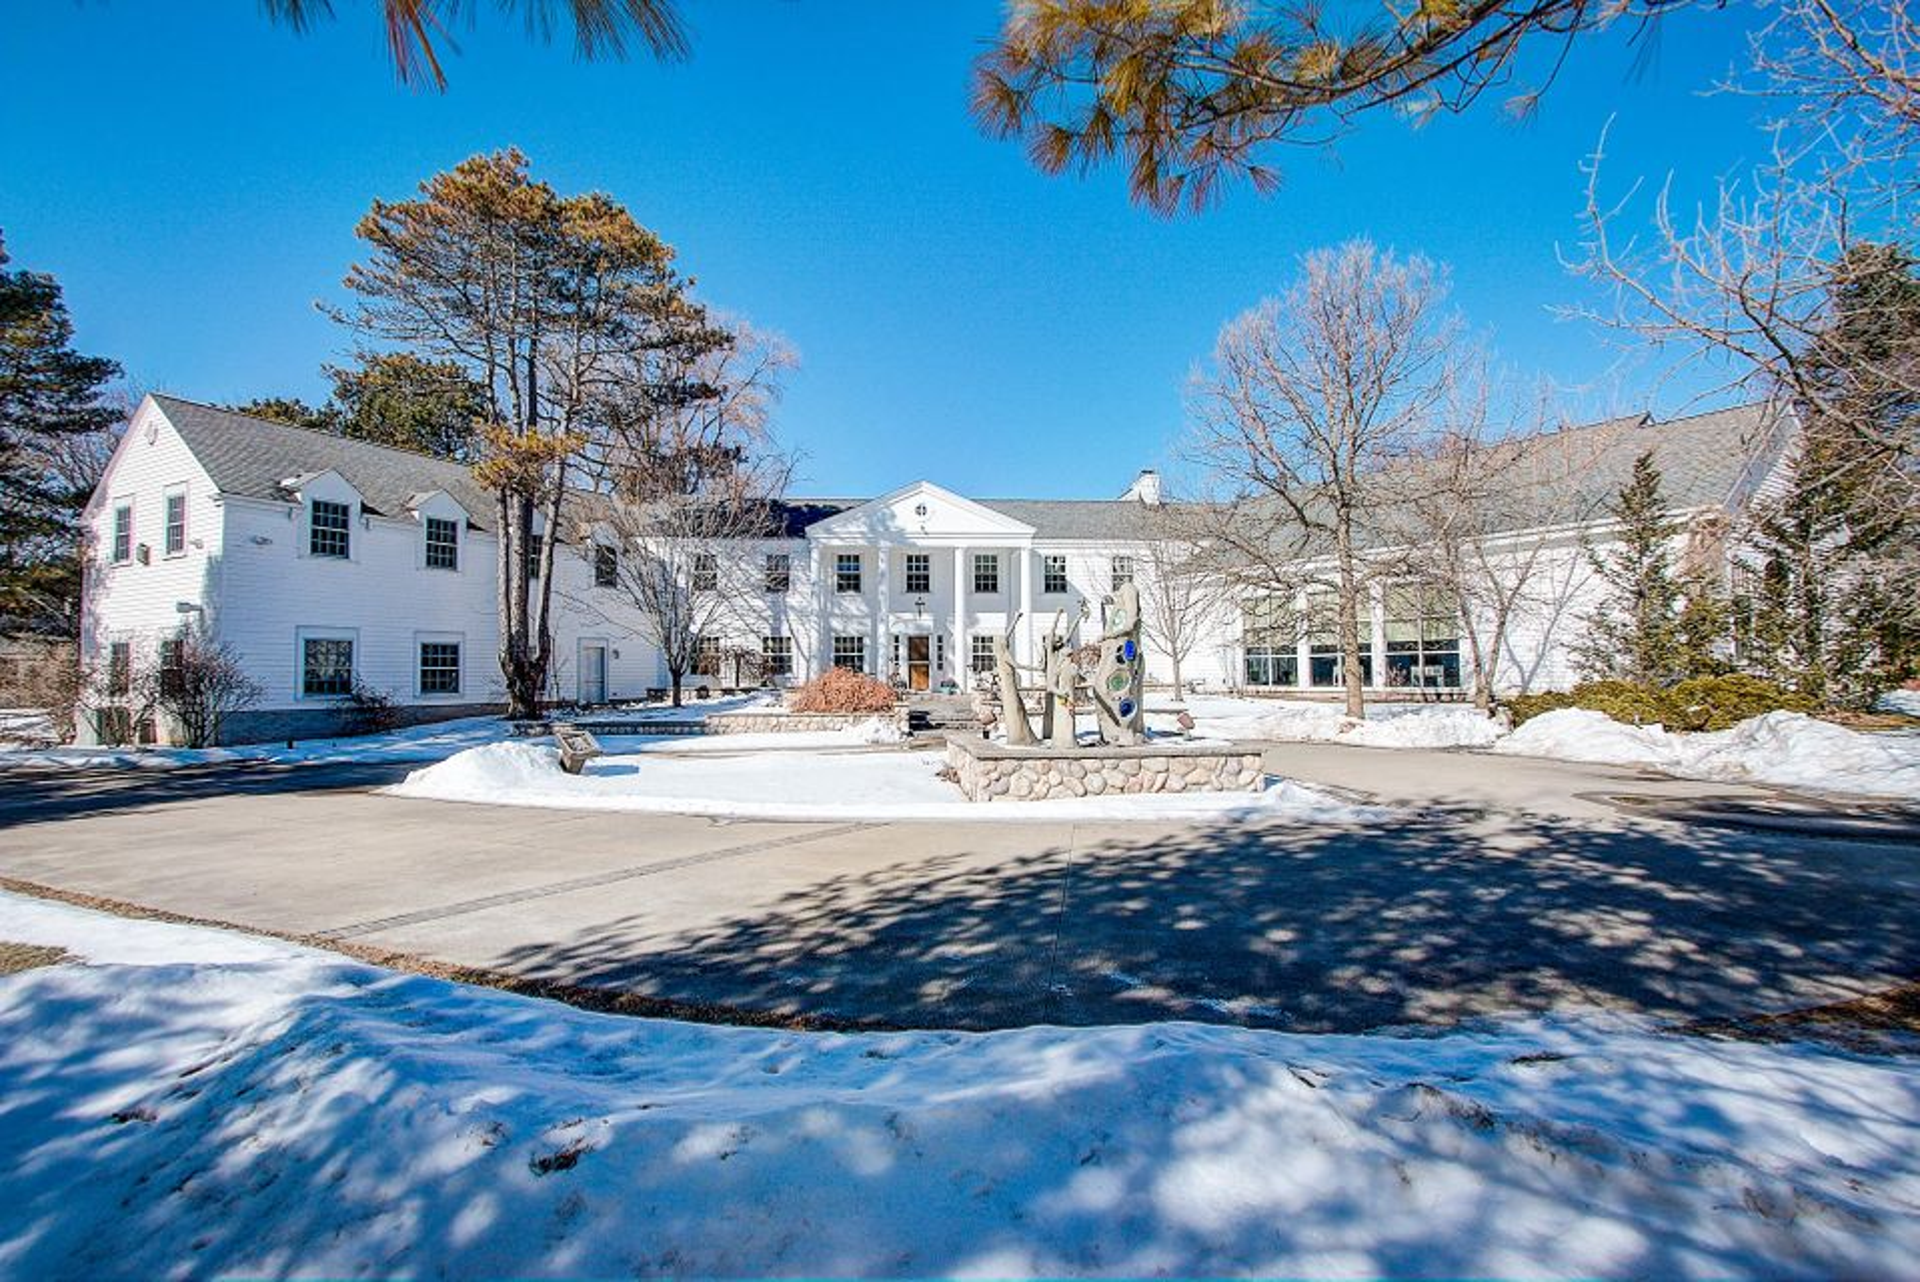 Single Family Home for Sale at 1400 E Fox Lane 1400 E Fox Lane Fox Point, Wisconsin 53217 United States